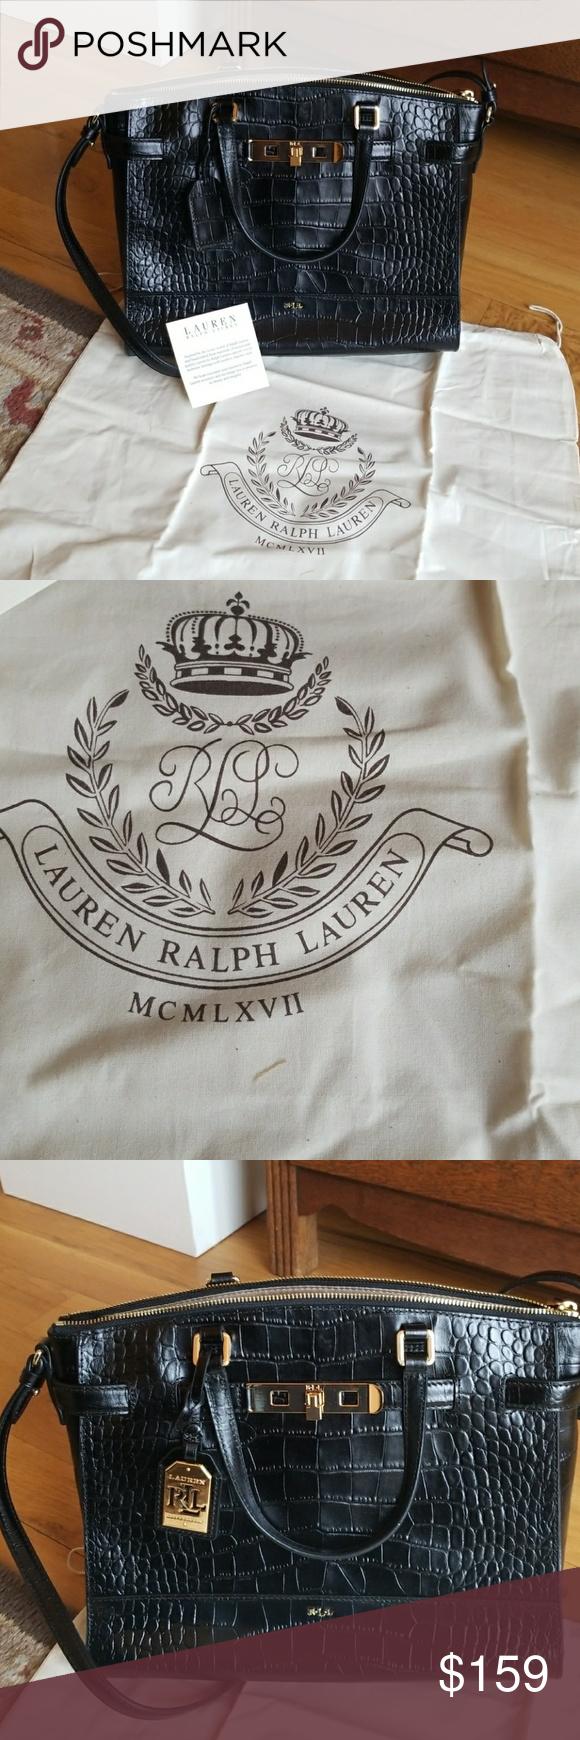 56275cdad000 ... order gorgeous ralph lauren darwin croc satchel beautiful never used  black leather croc embossed bag by